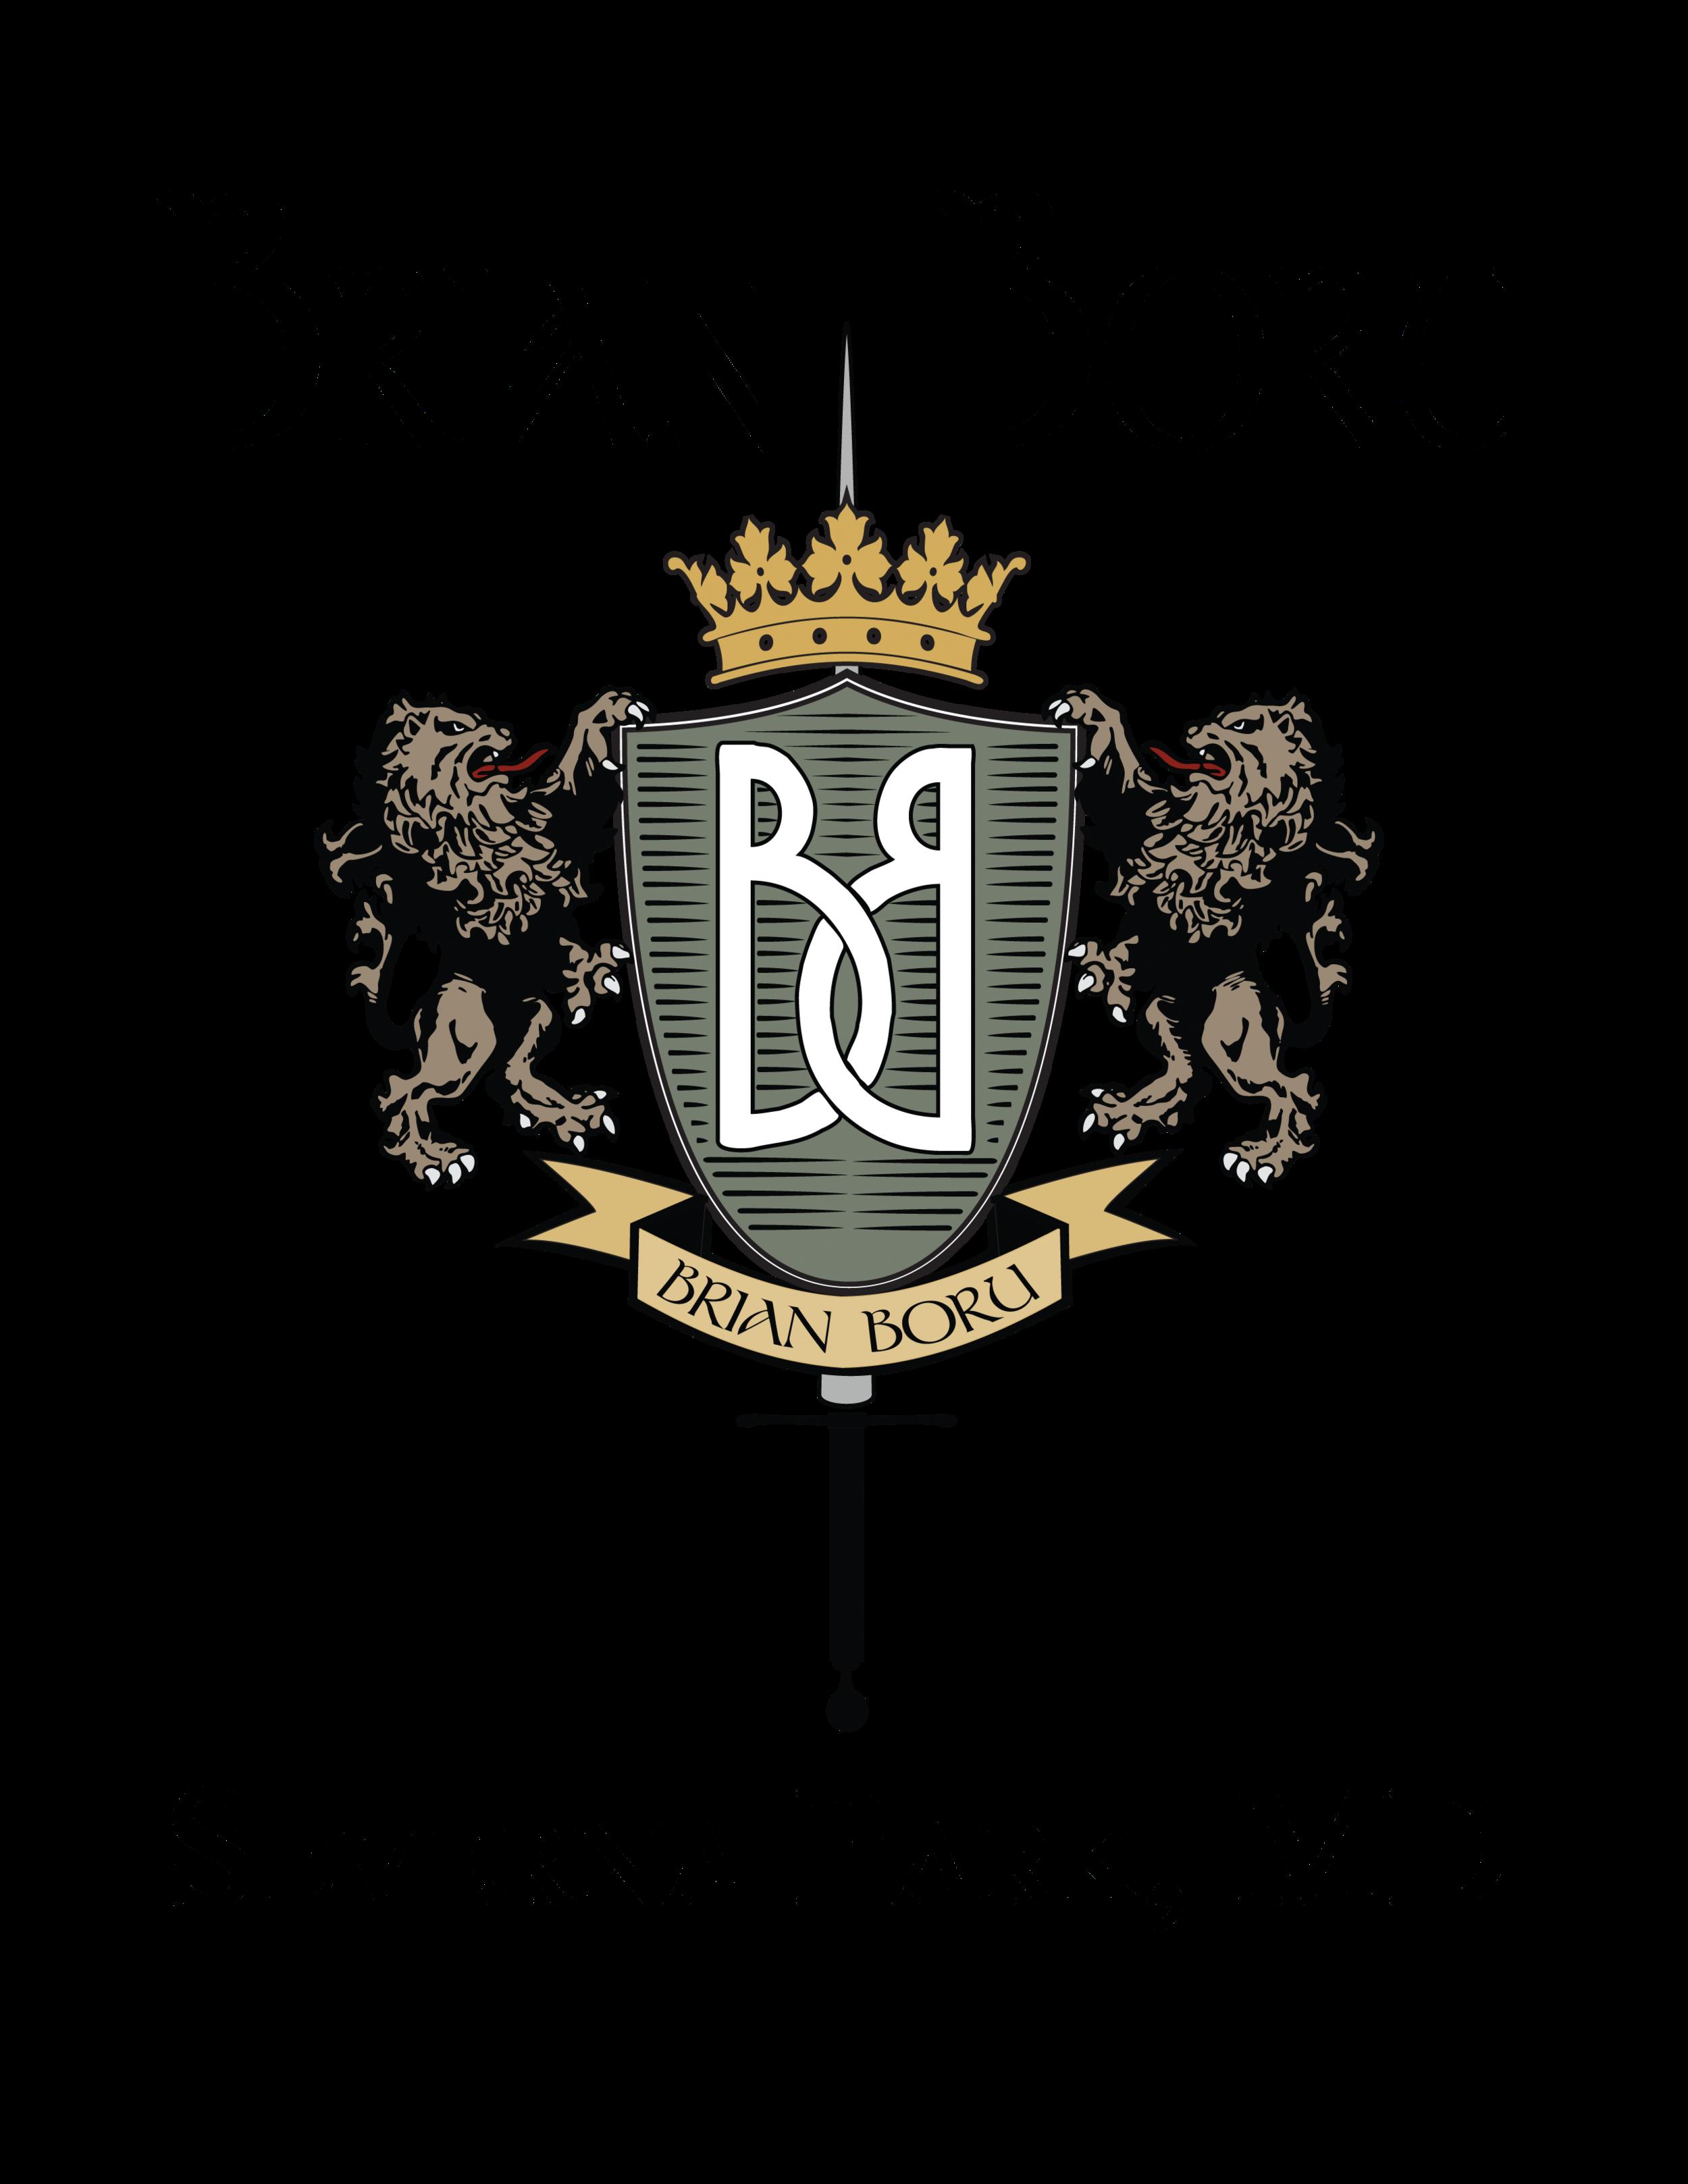 BB Final logo color (Killarney OfficePC's conflicted copy 2012-10-11).png